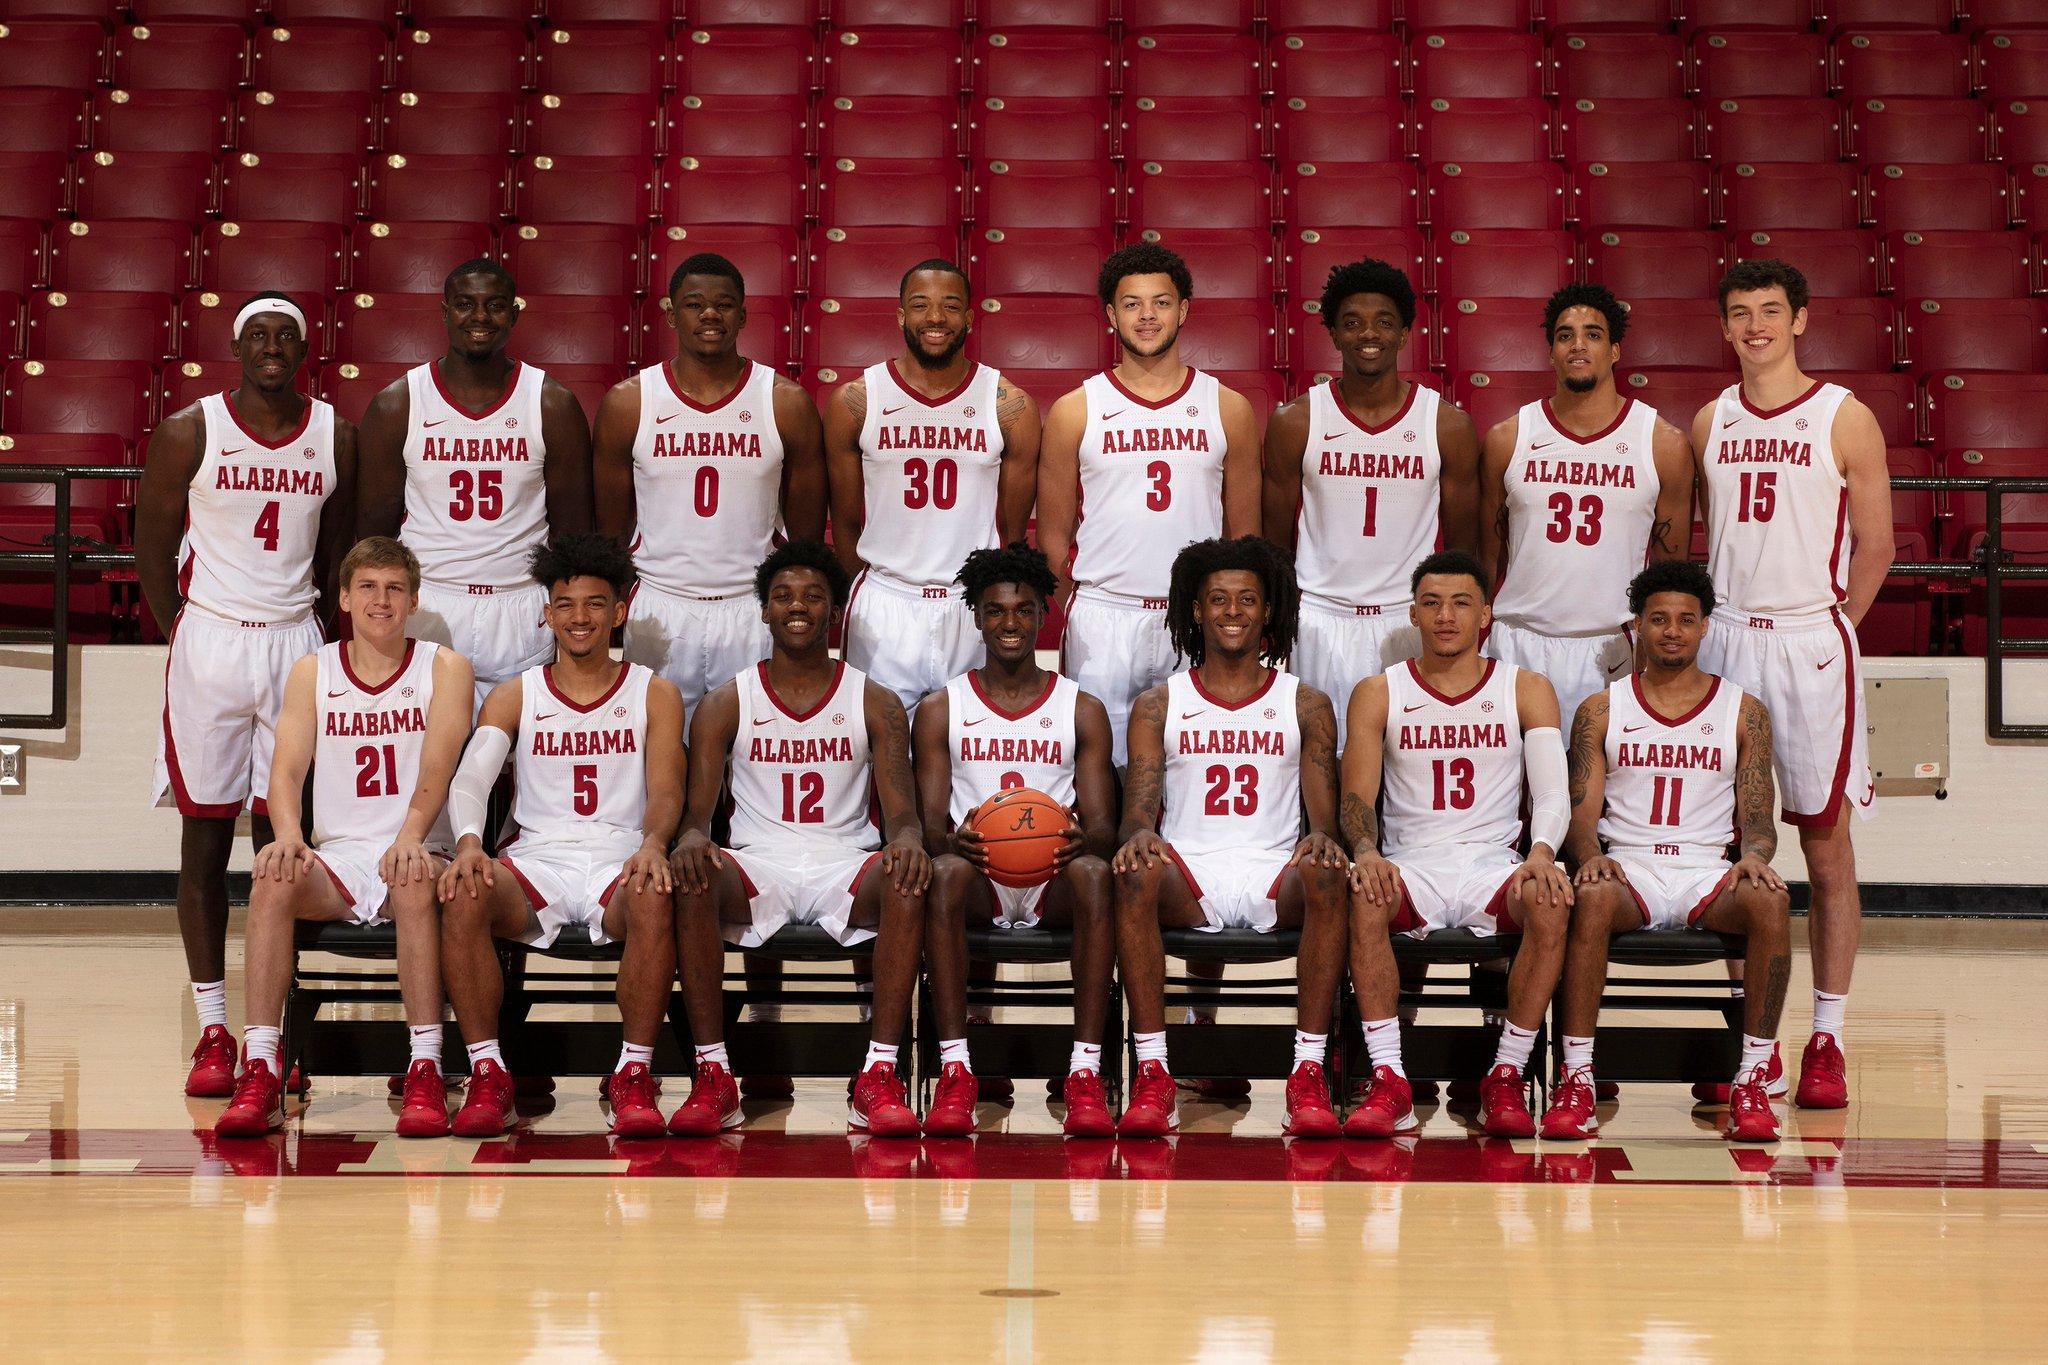 Alabama Crimson Tide NCAA Basketball: One Team. One Family.  Your 2019-20 @AlabamaMBB squad‼️   #Roll.  Tweet by @AlabamaMBB